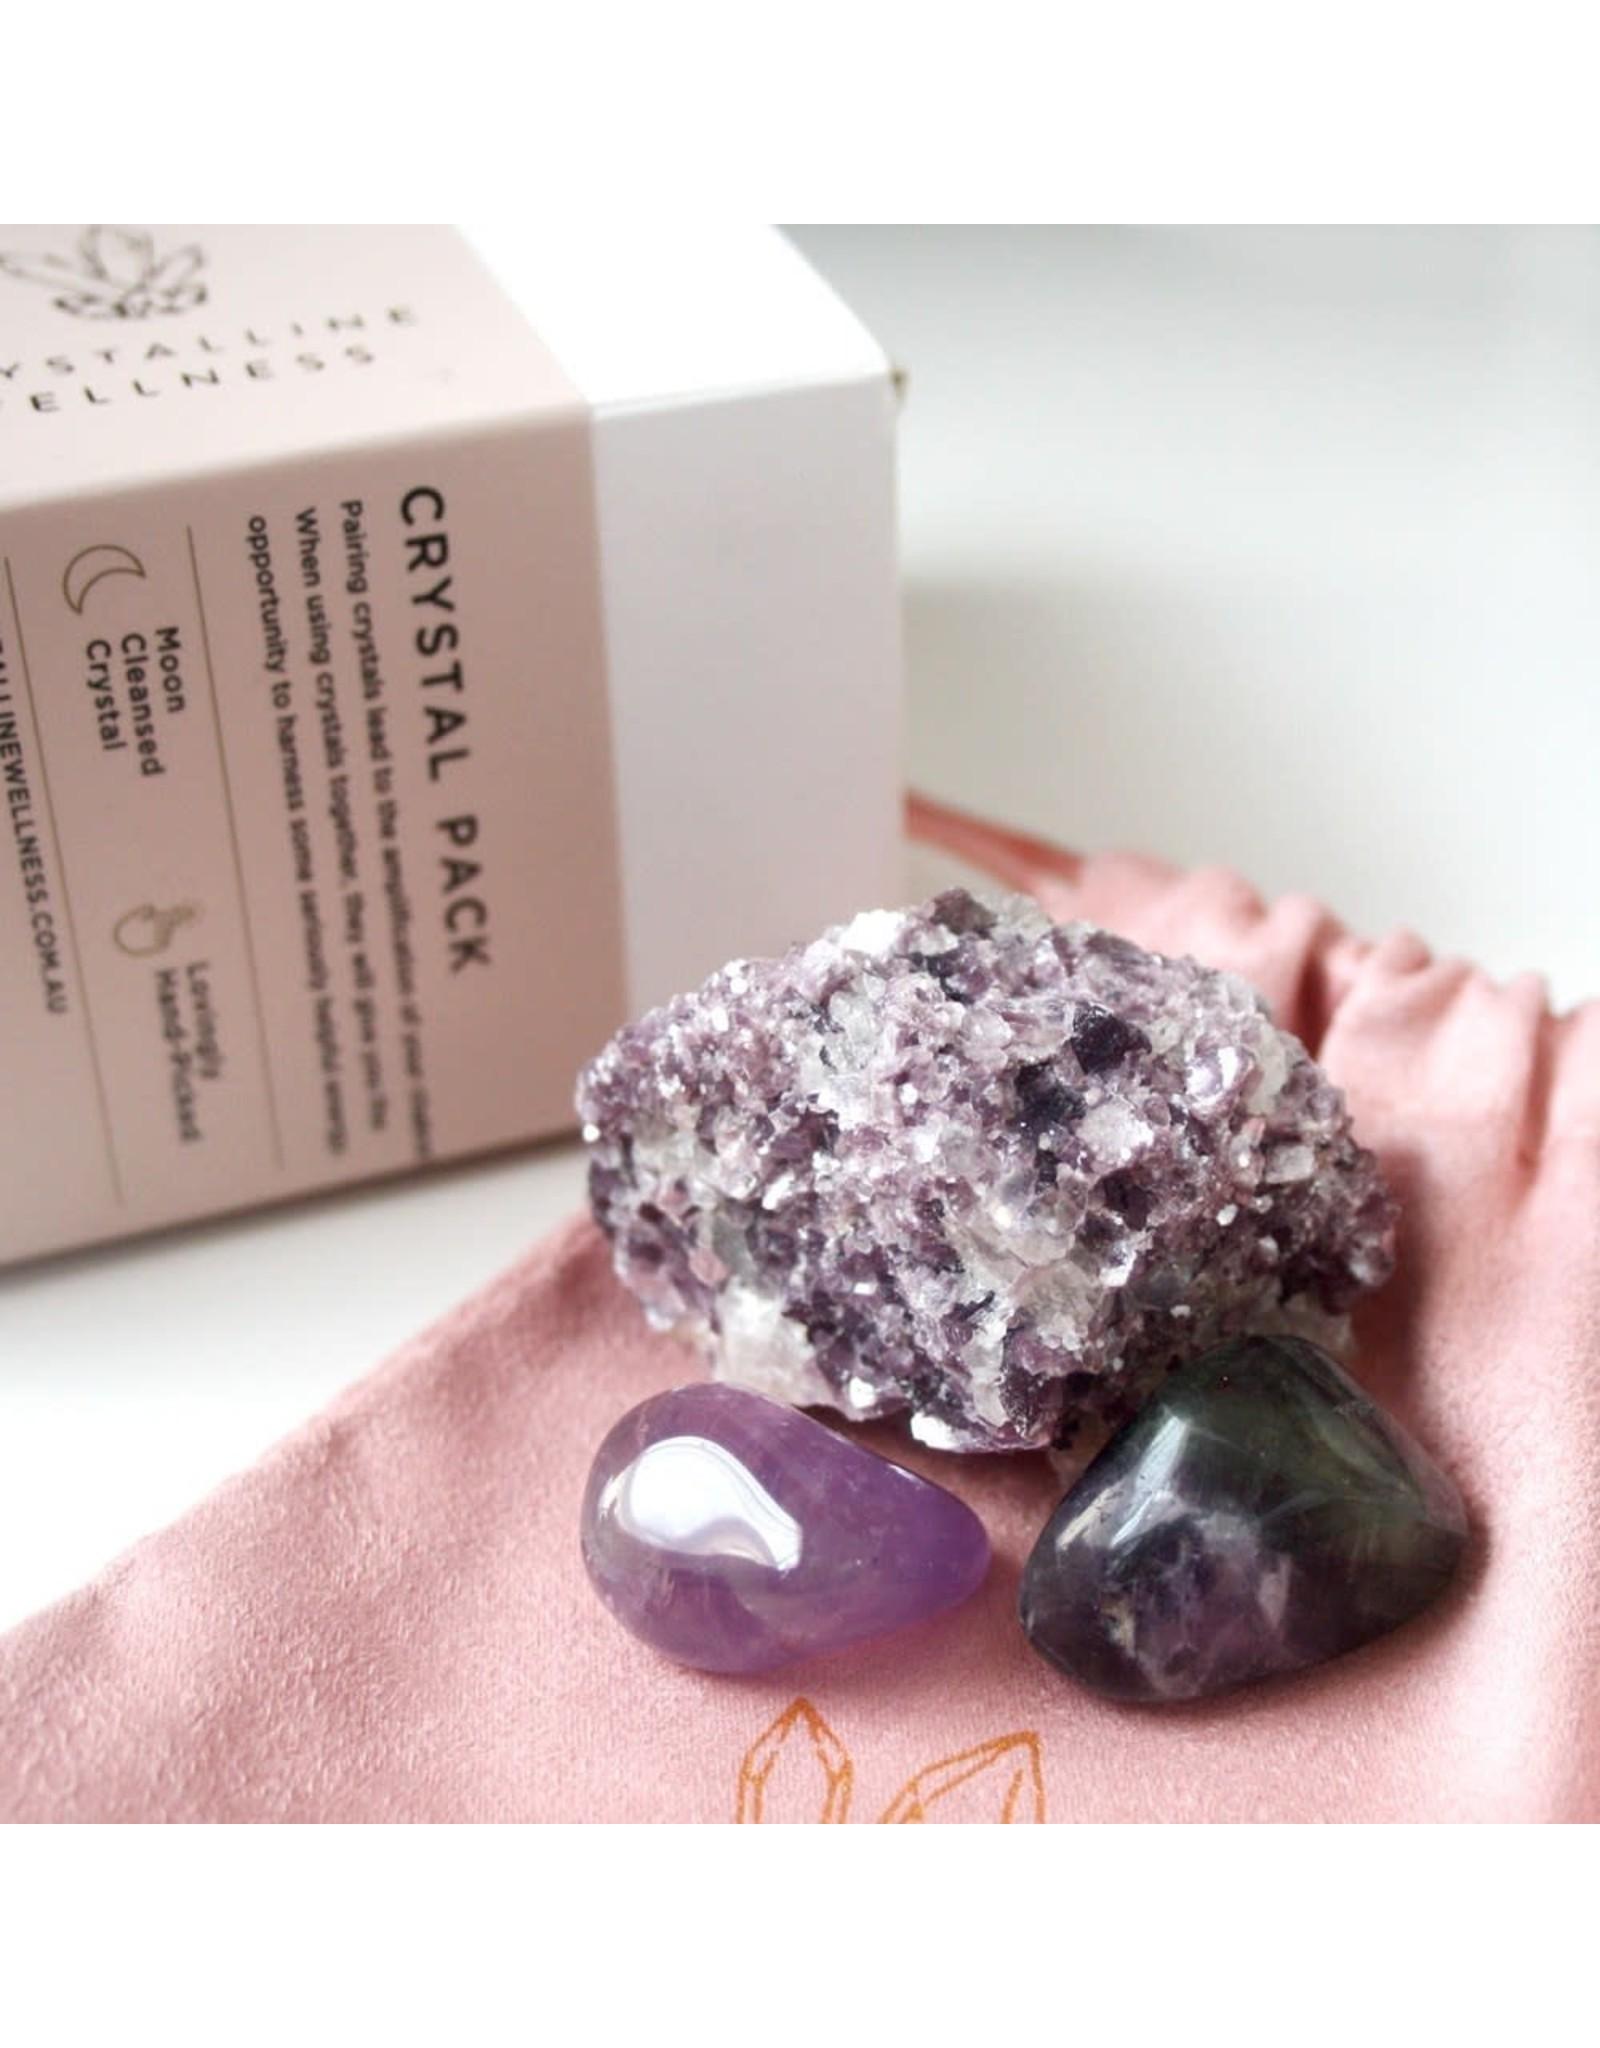 Crystalline Wellness Crystal Packs - Stress Less